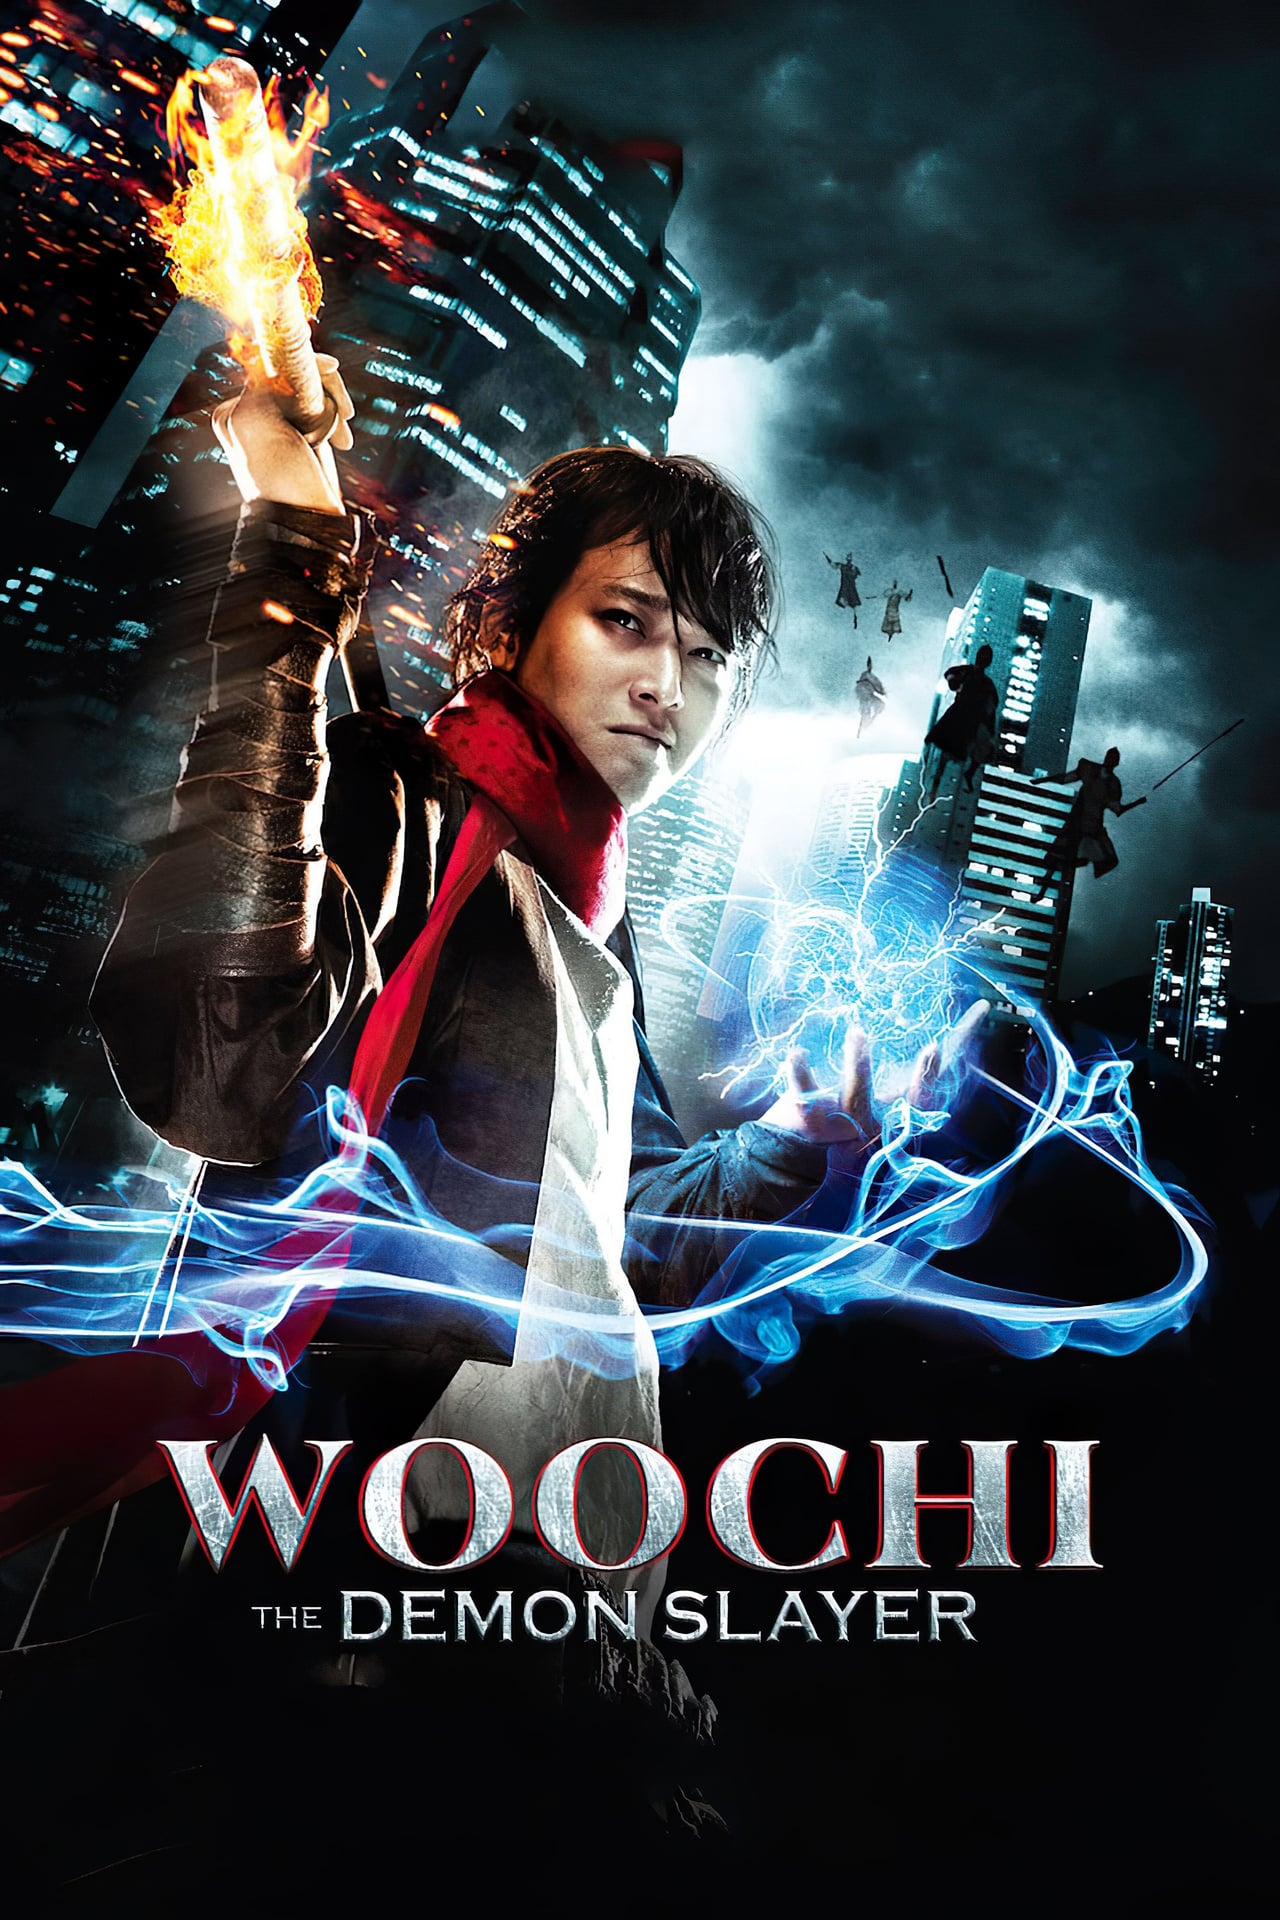 Woochi : The Demon Slayer